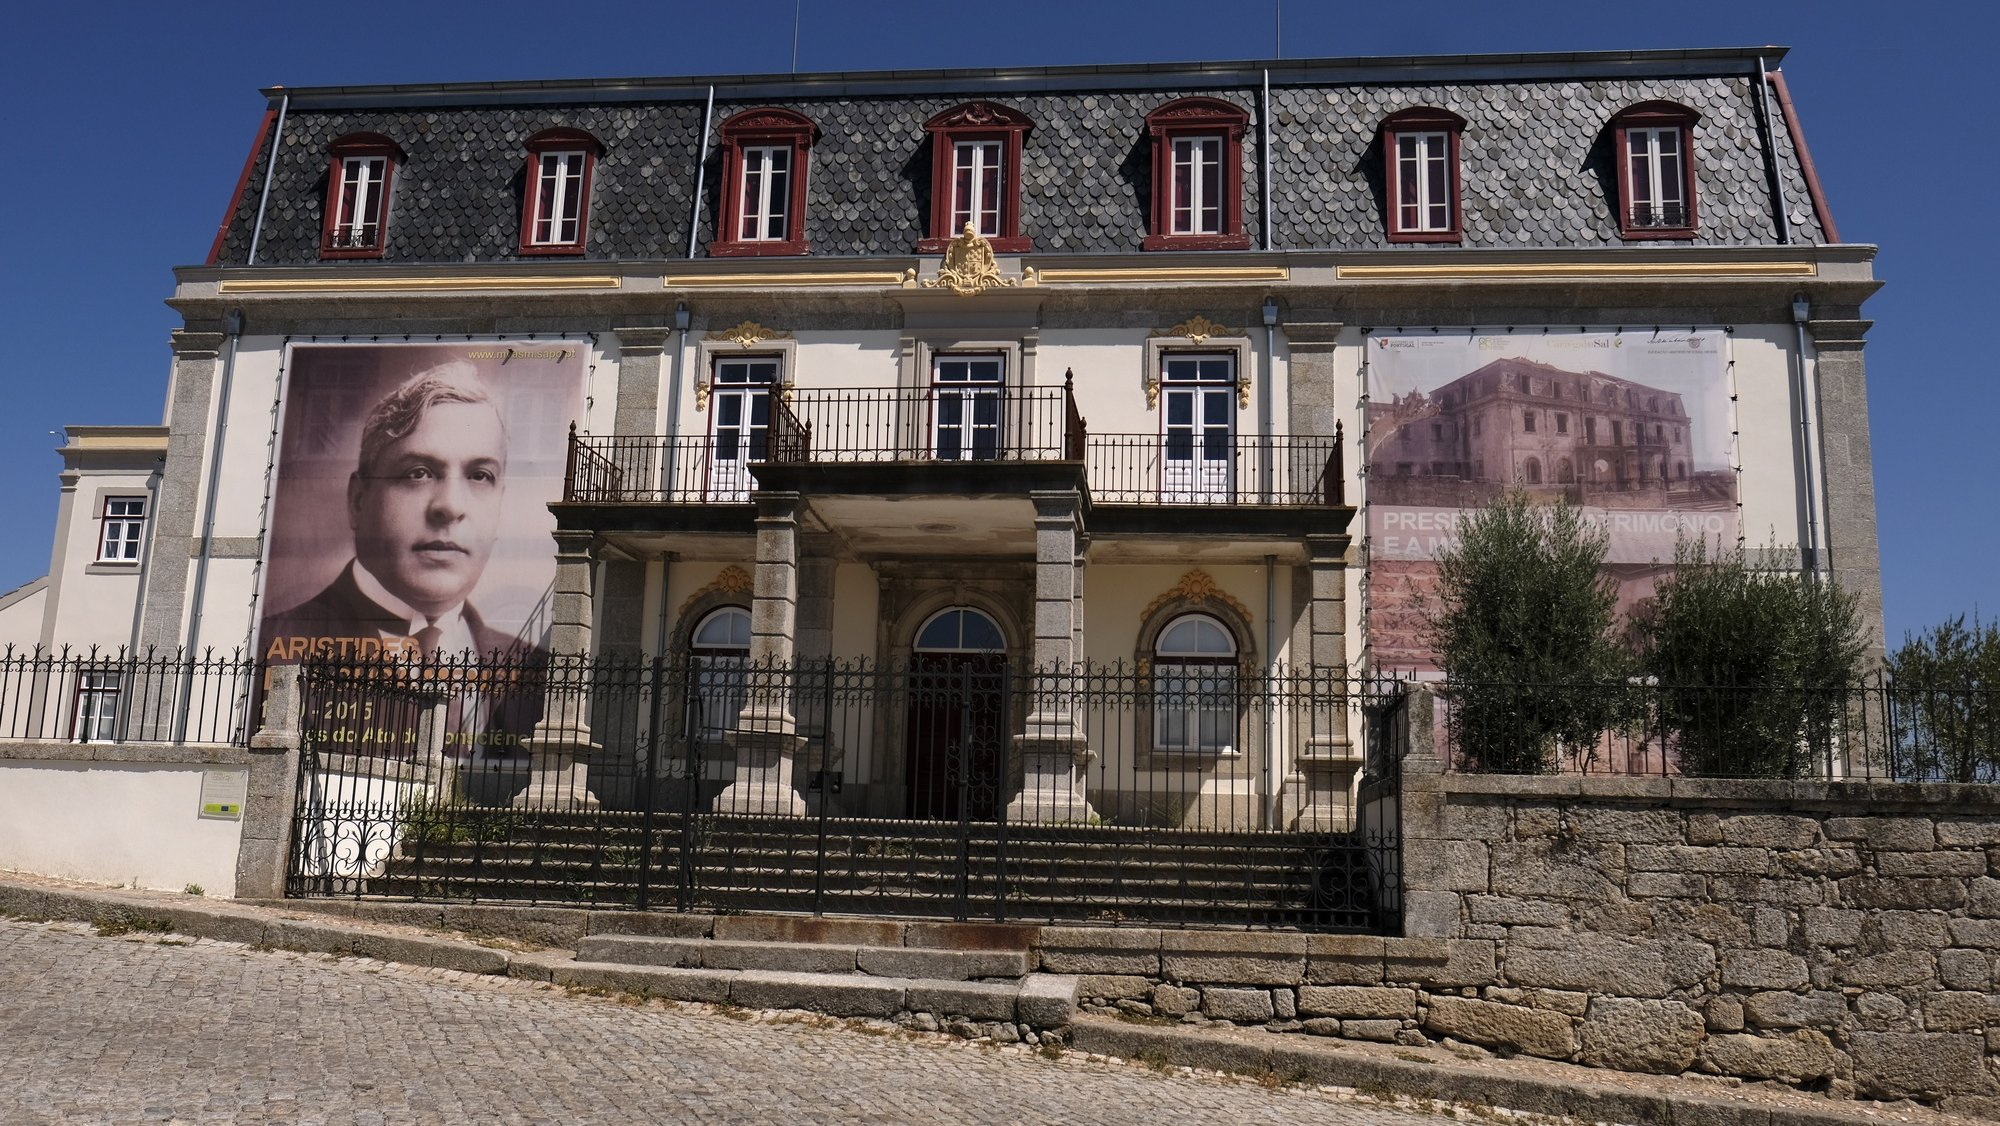 Casa de Aristides de Sousa Mendes, em Cabanas de Viriato, Carregal do Sal, Distrito de Viseu, 14 de setembro de 2017. NUNO ANDRÉ FERREIRA / LUSA.